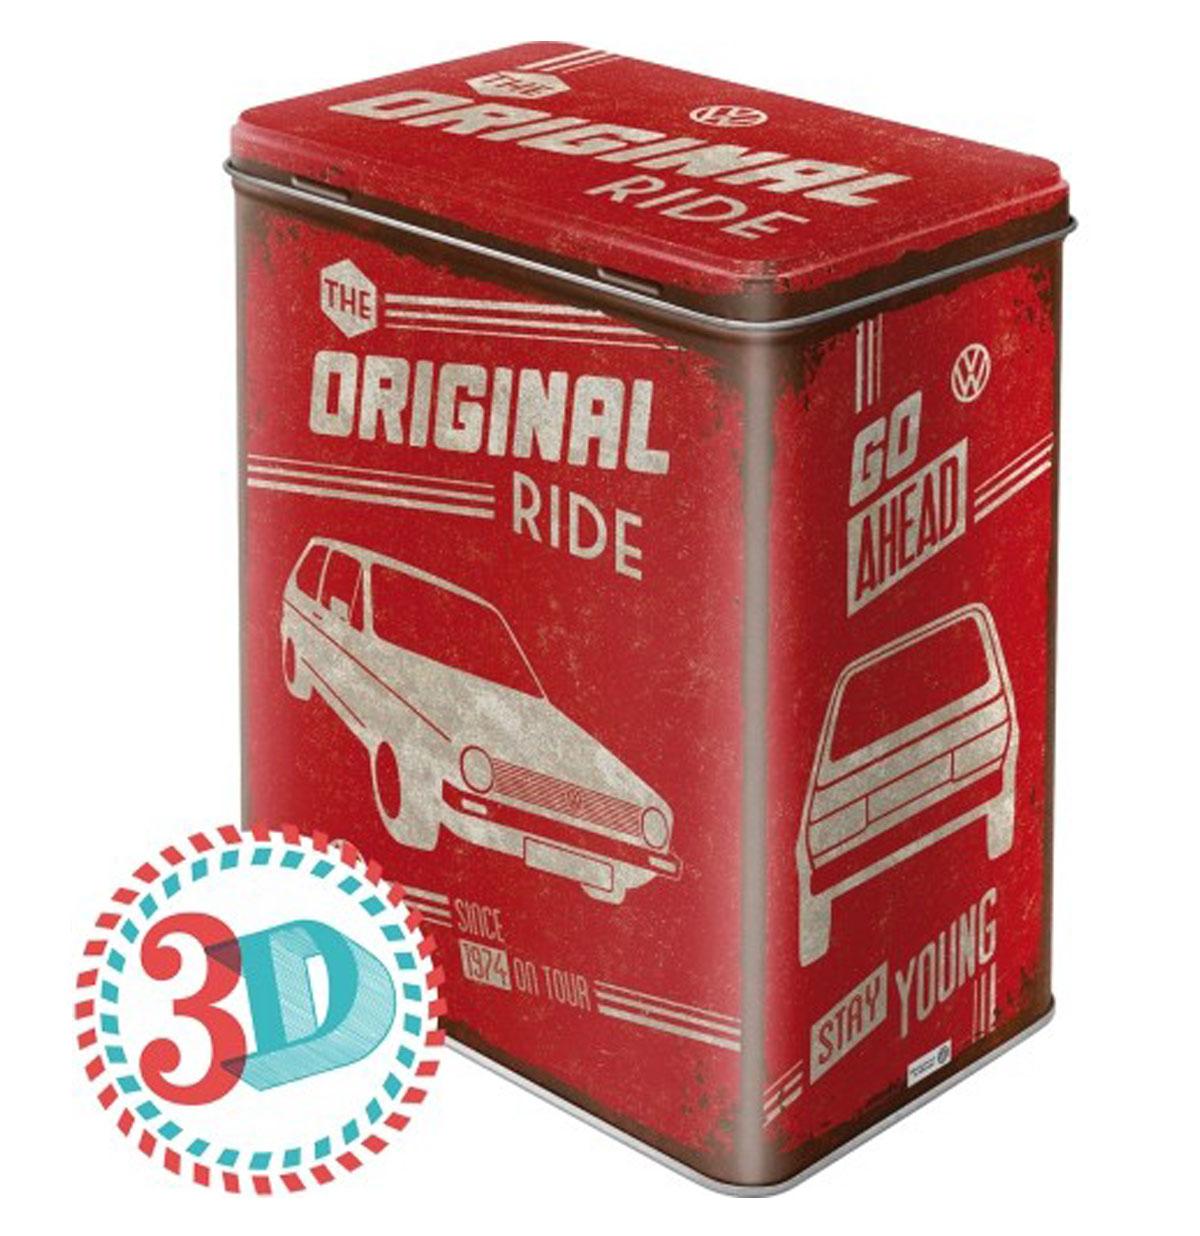 VW Volkswagen Golf The Original Ride Tin Box L